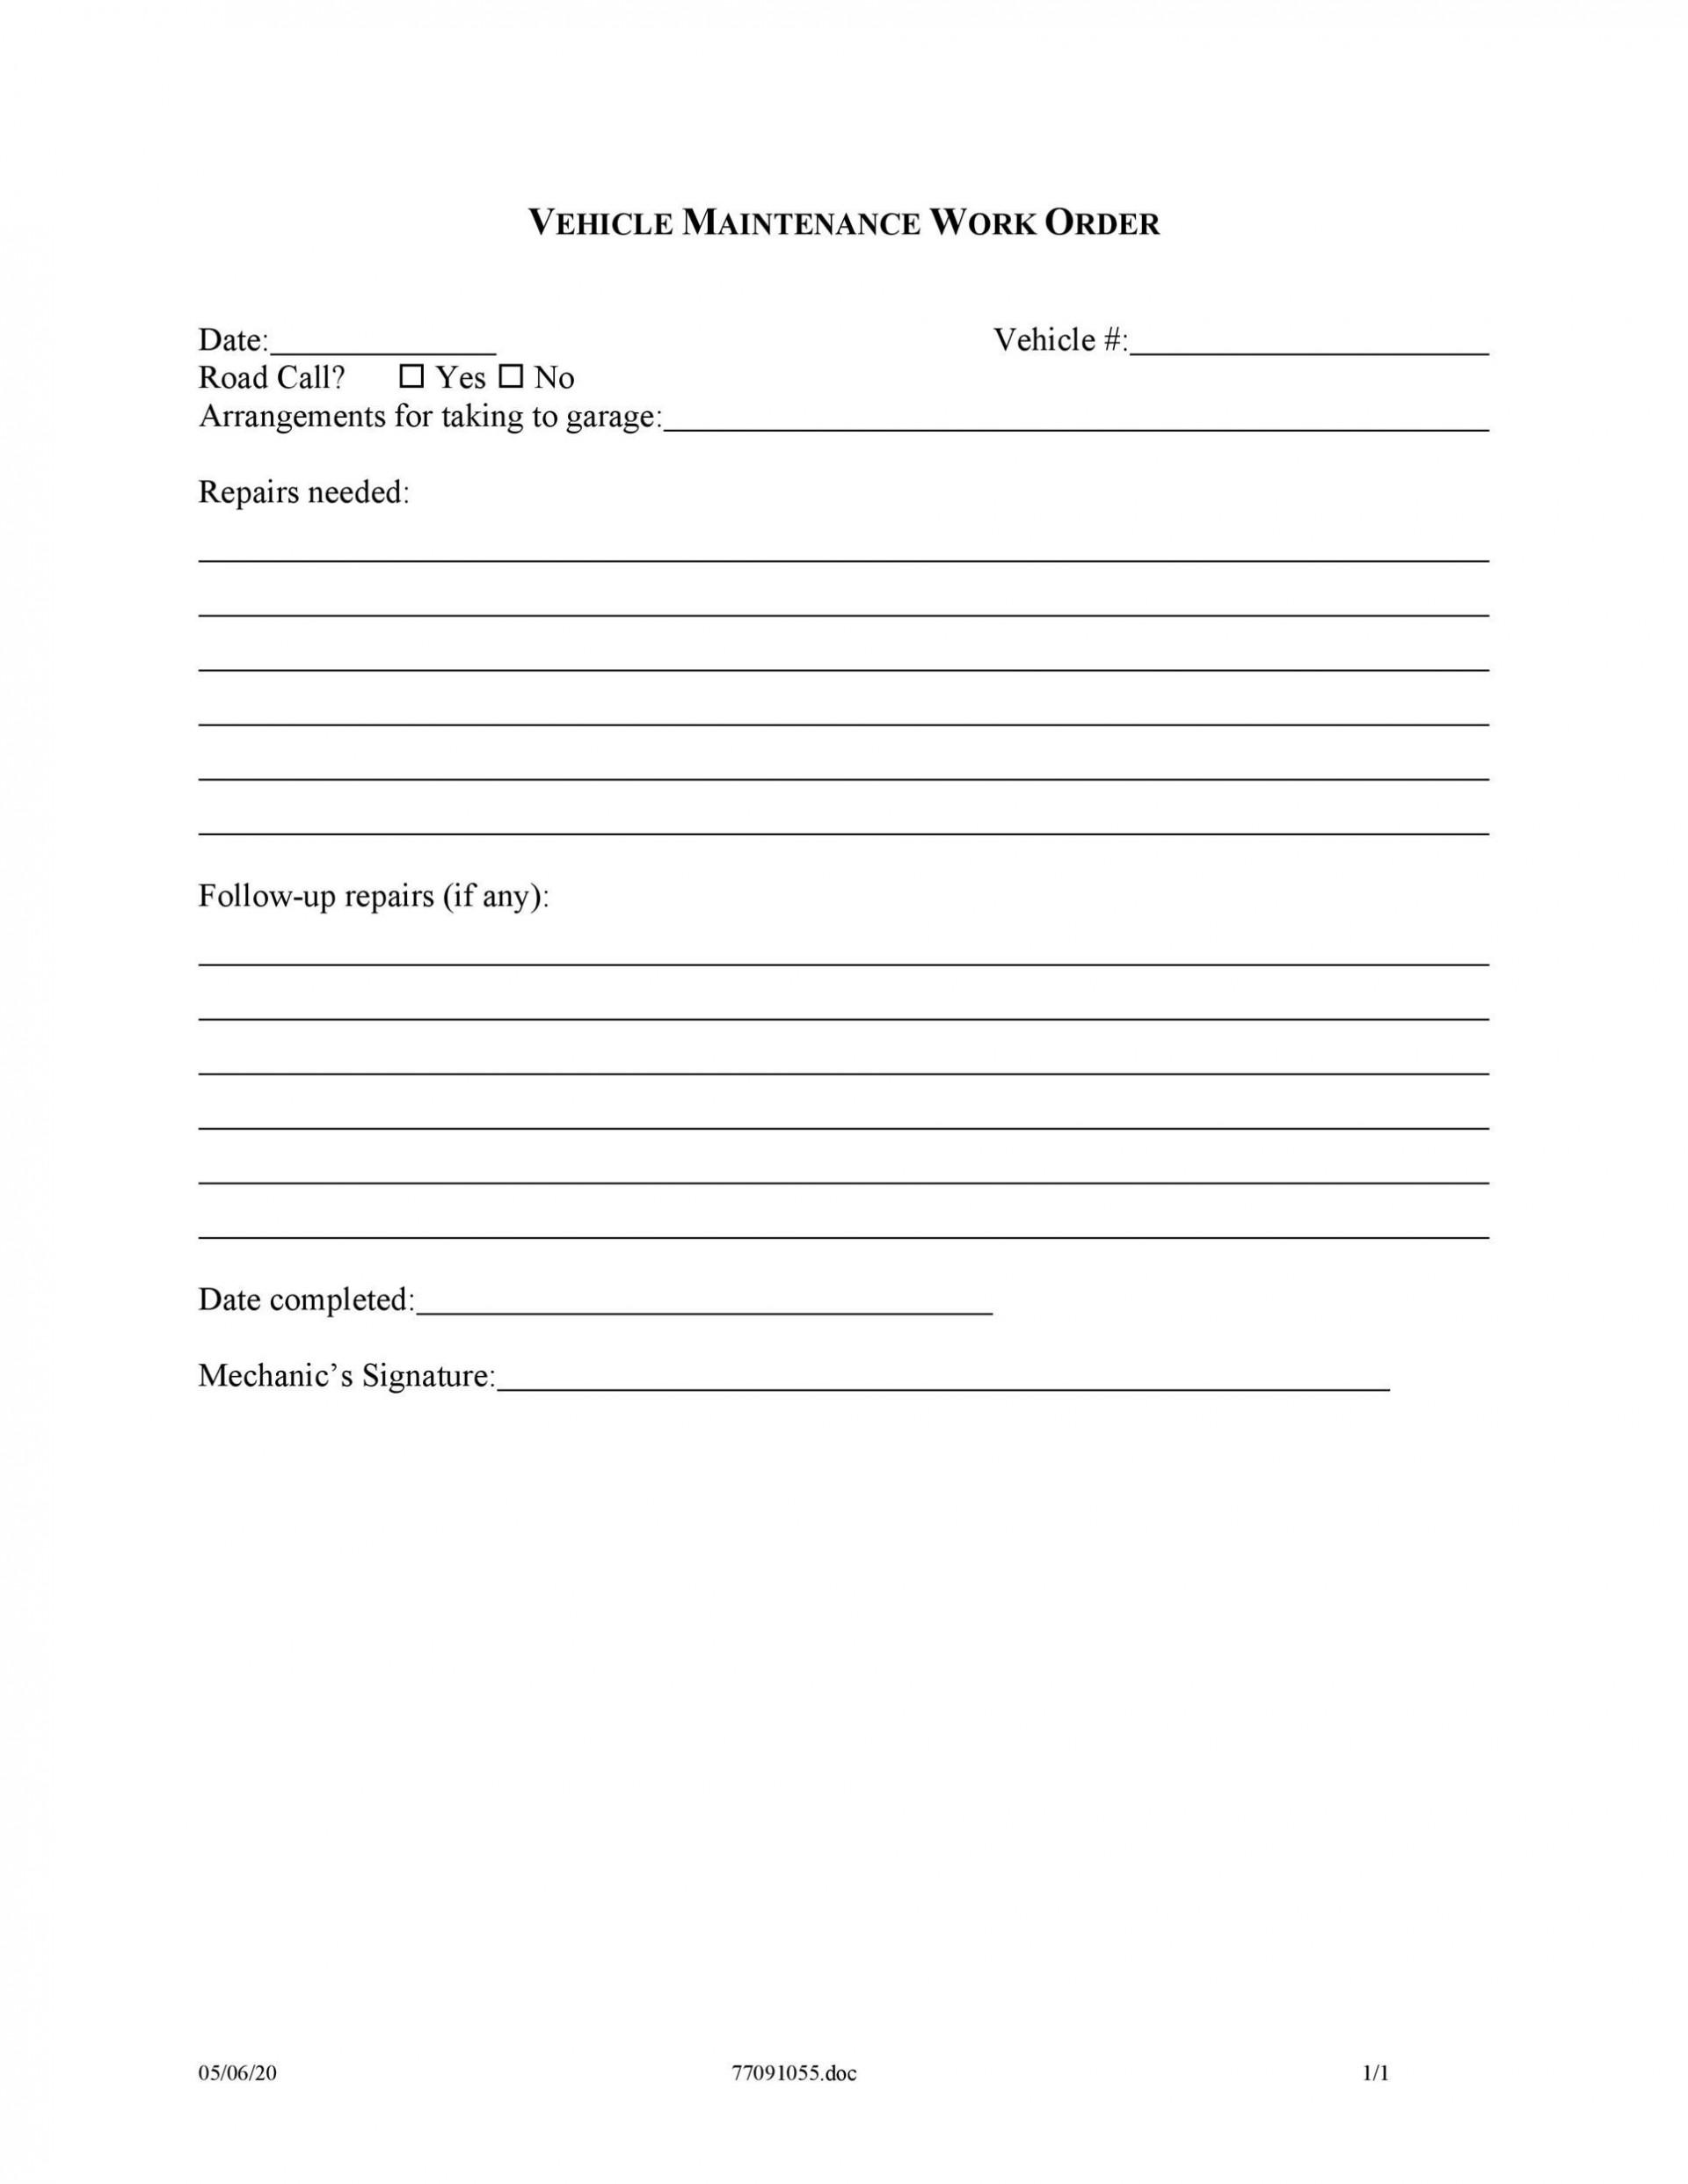 009 Sensational Maintenance Work Order Template Picture  Form Free Sample1920